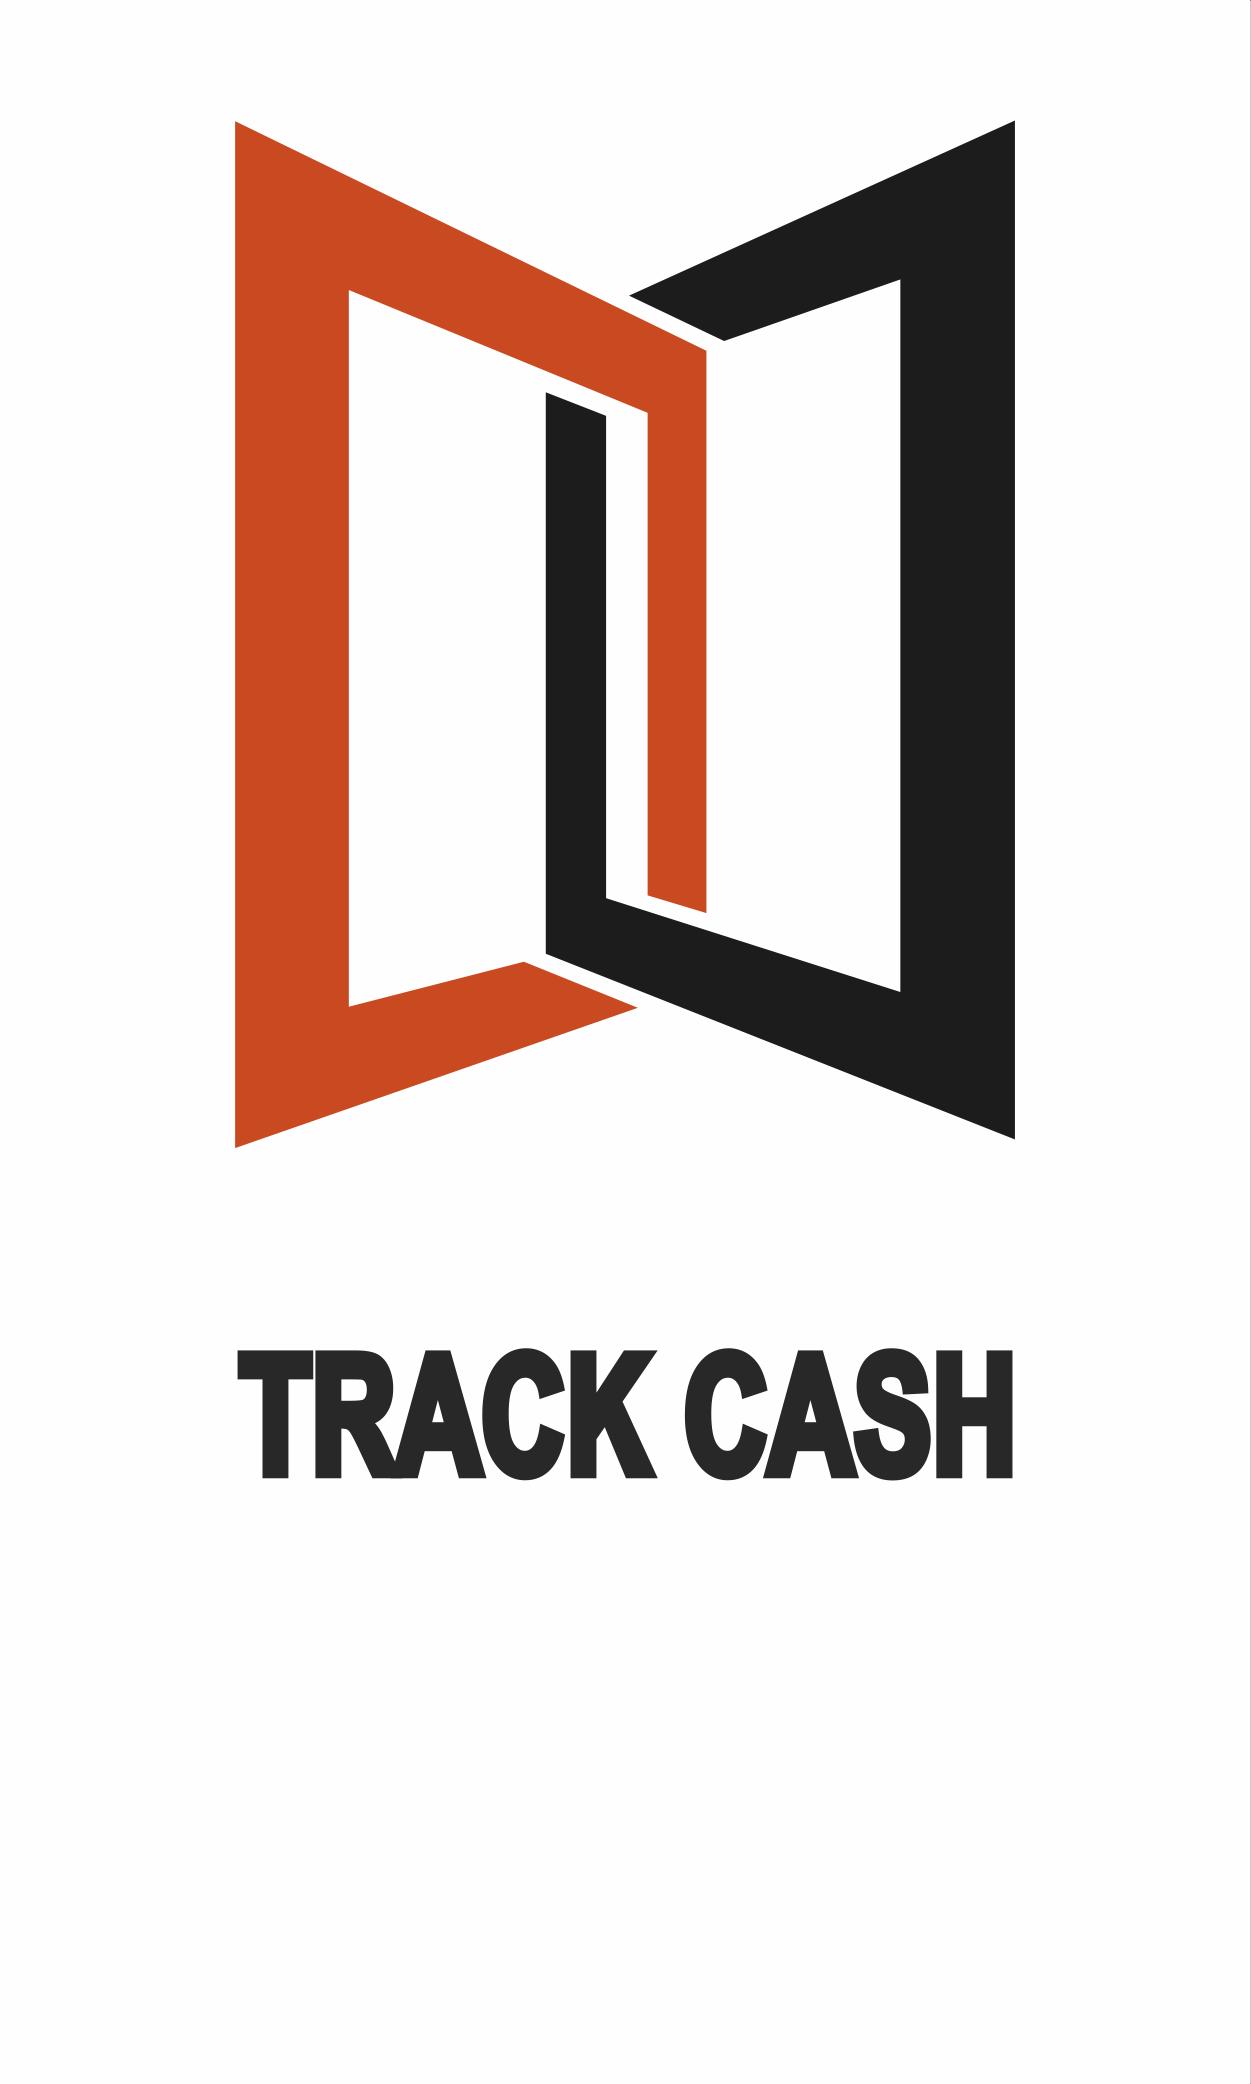 Track Cash